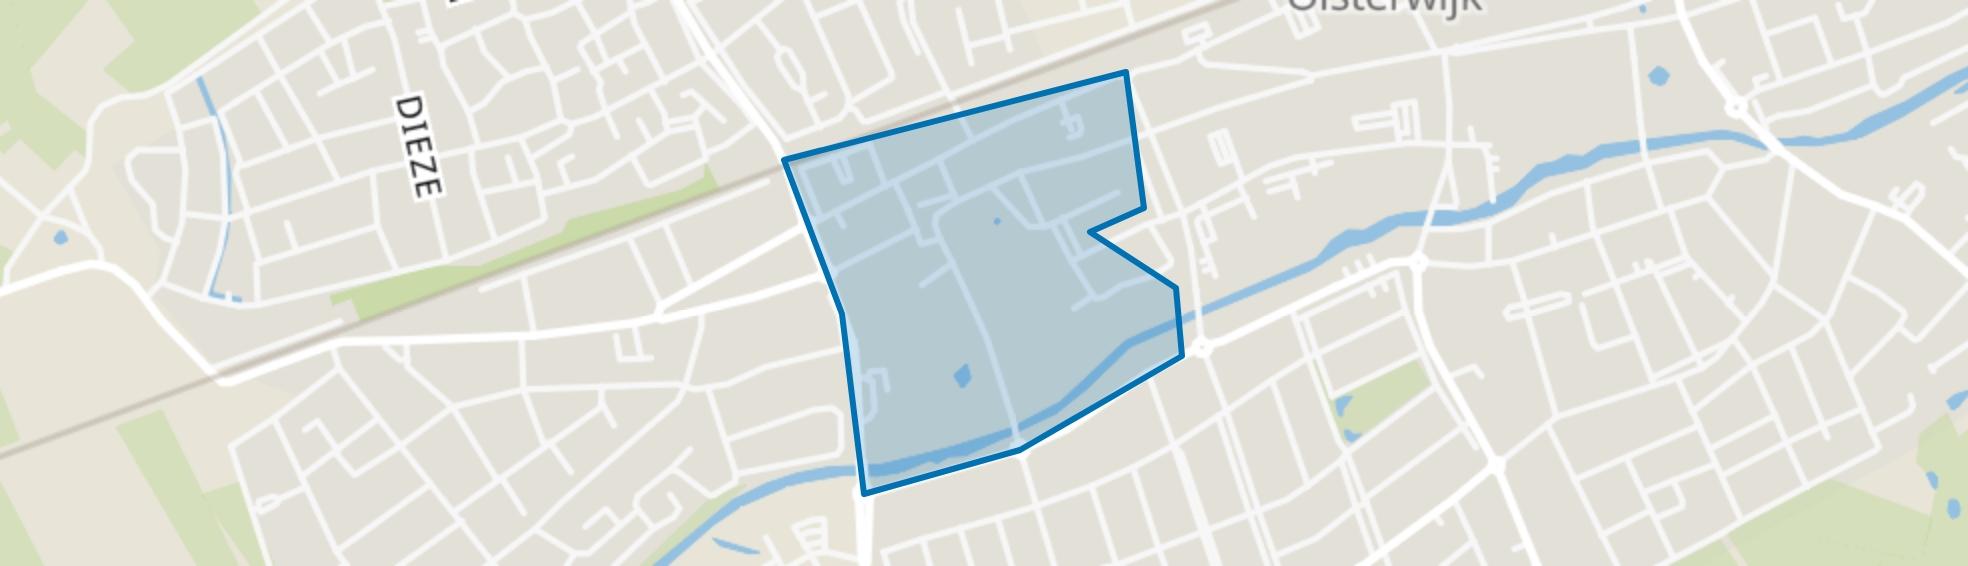 Omg. Petrus-Kerk, Oisterwijk map